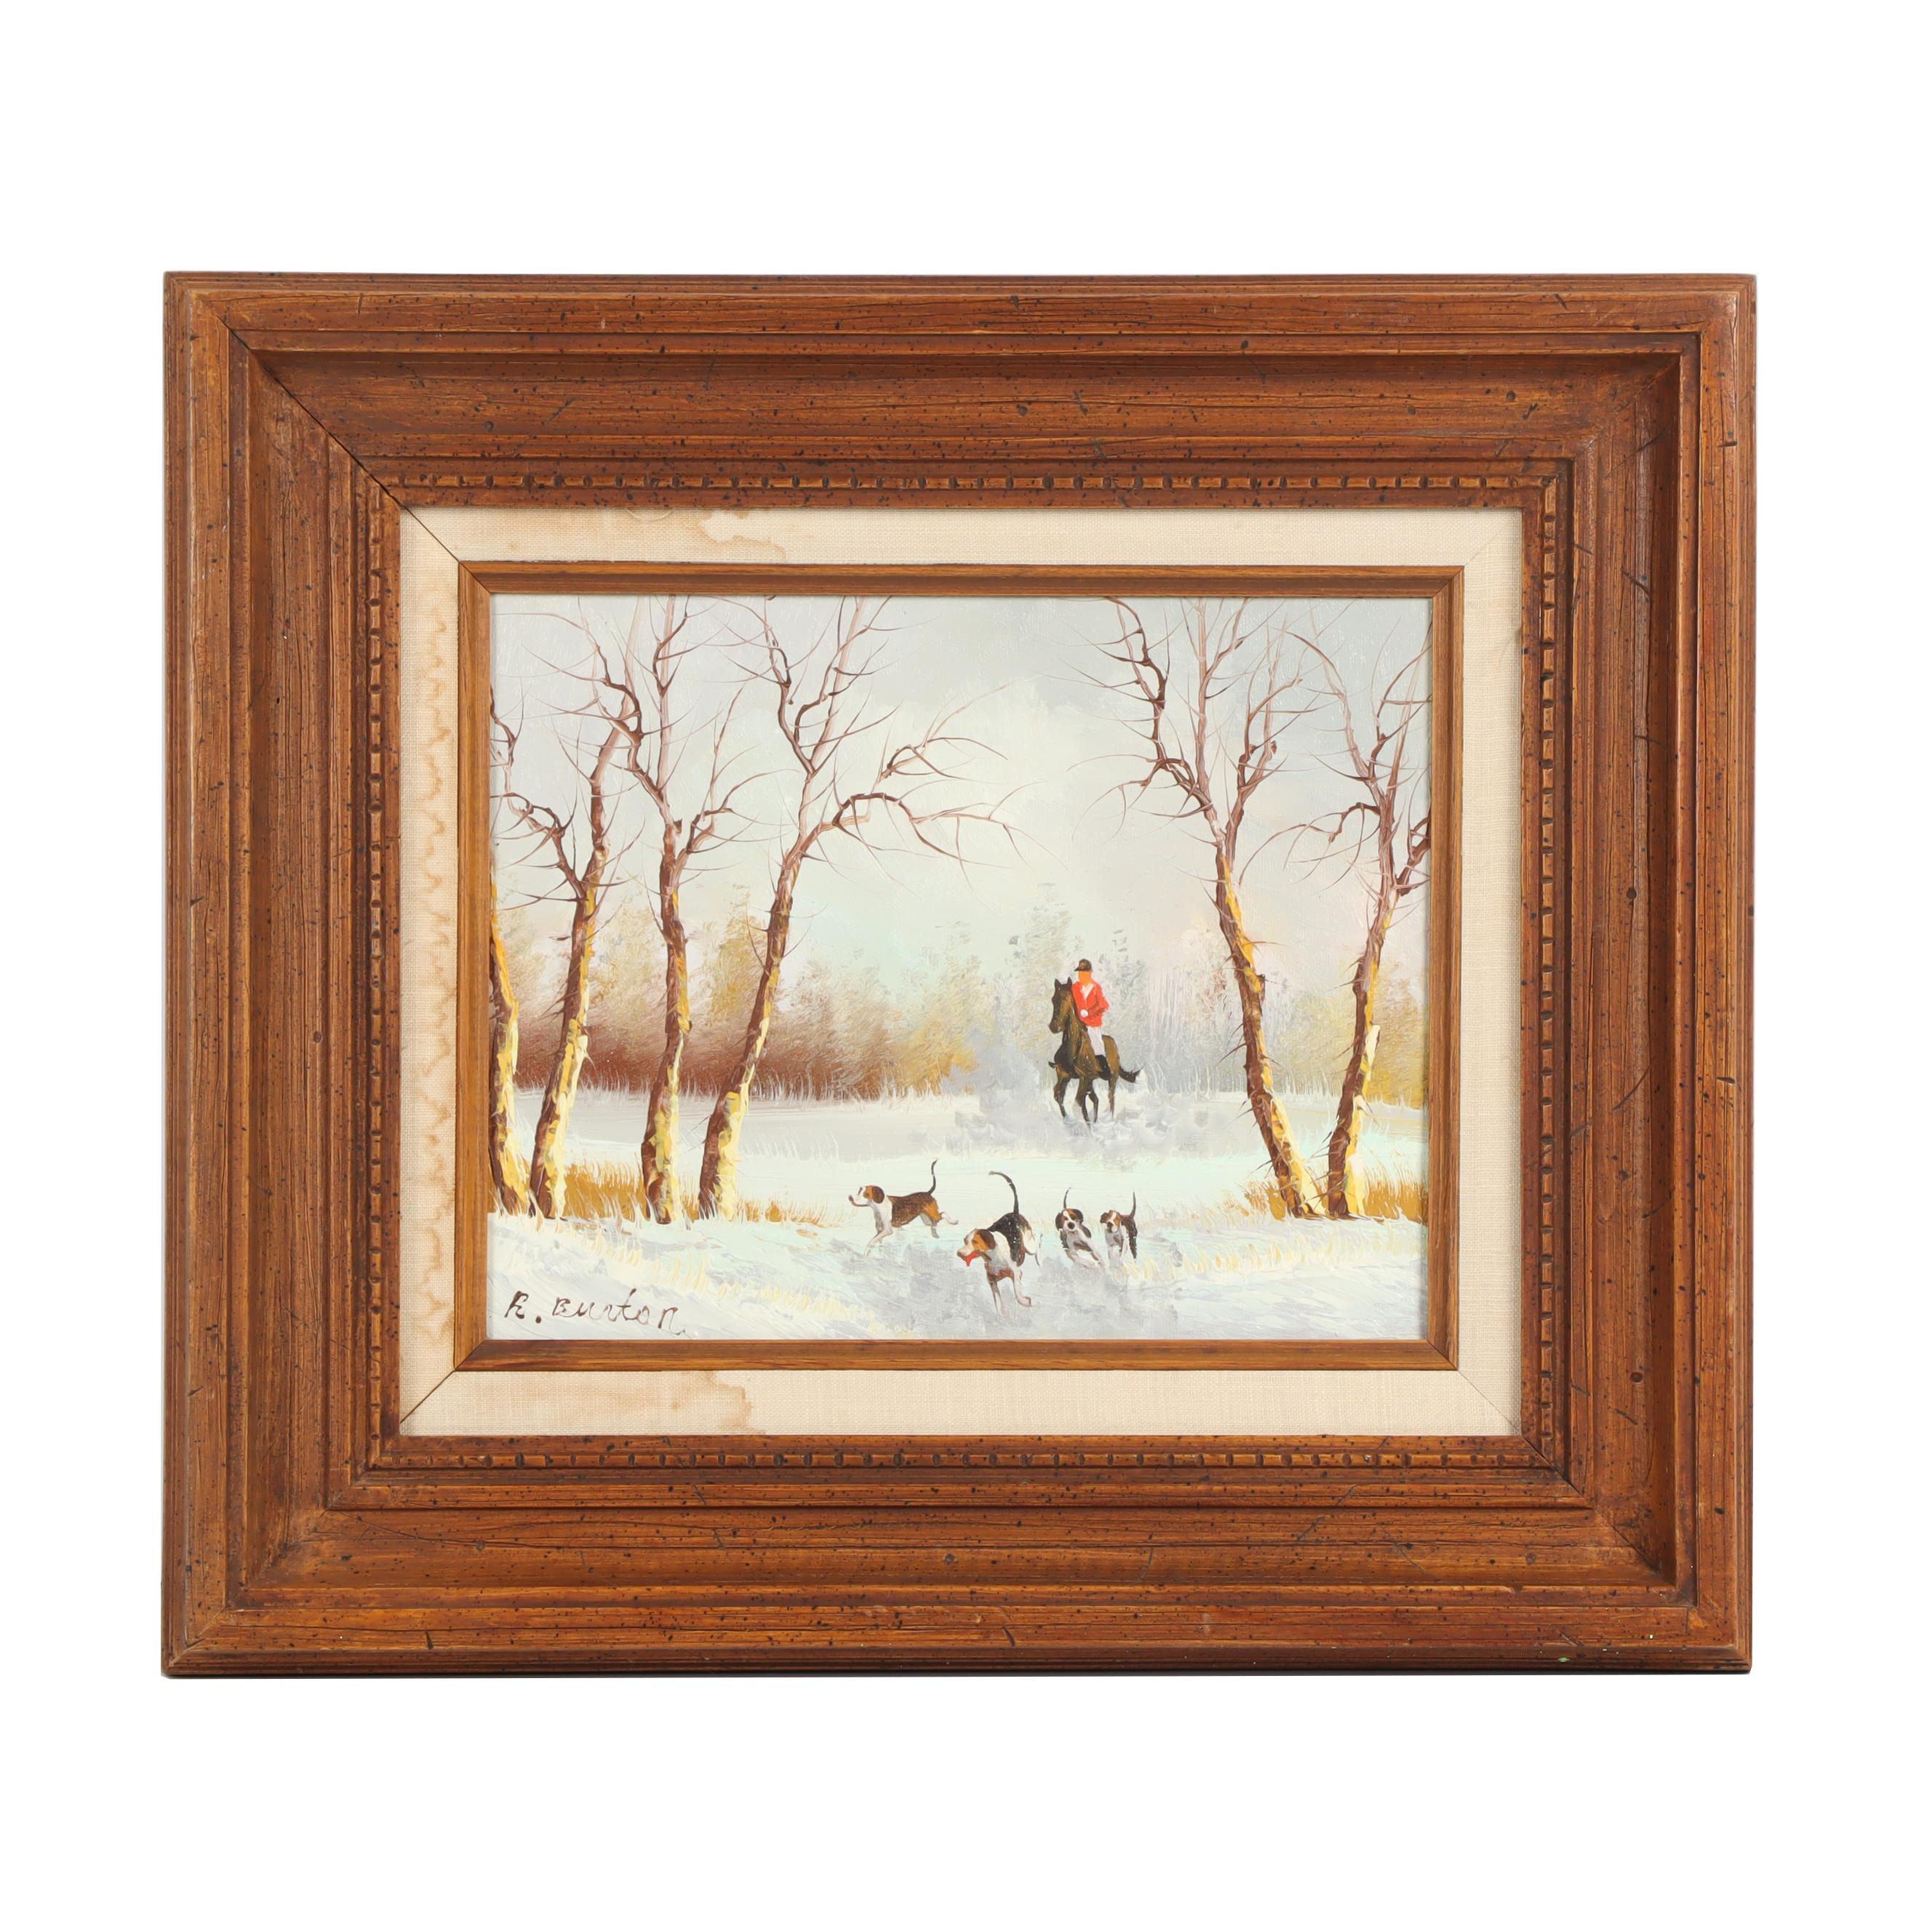 R. Burton Fox Hunting Oil Painting